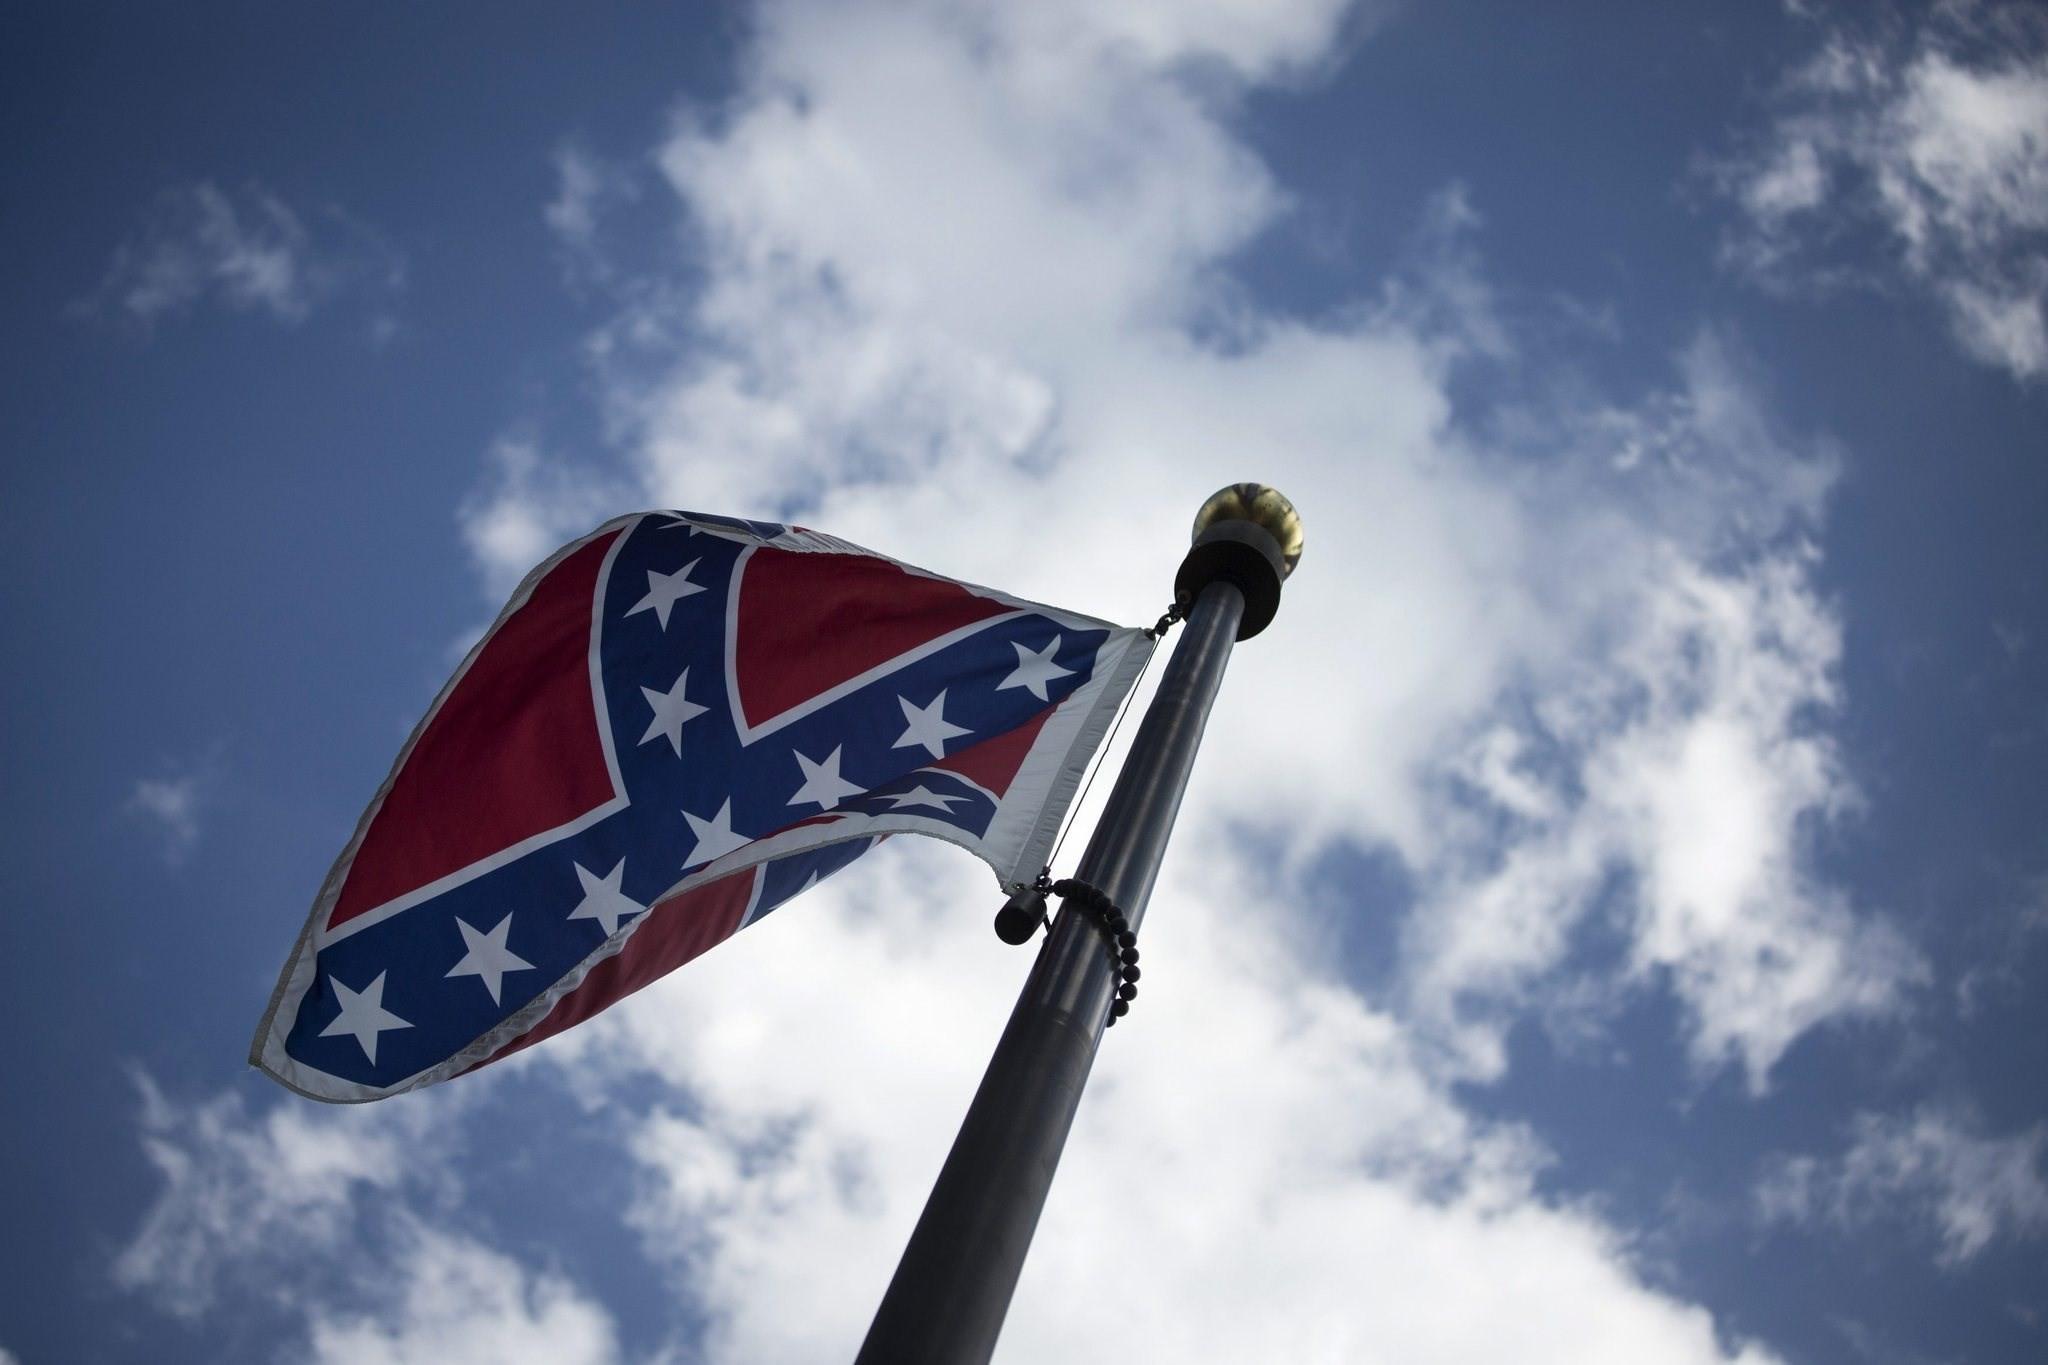 confederate flag free wallpaper and screensavers